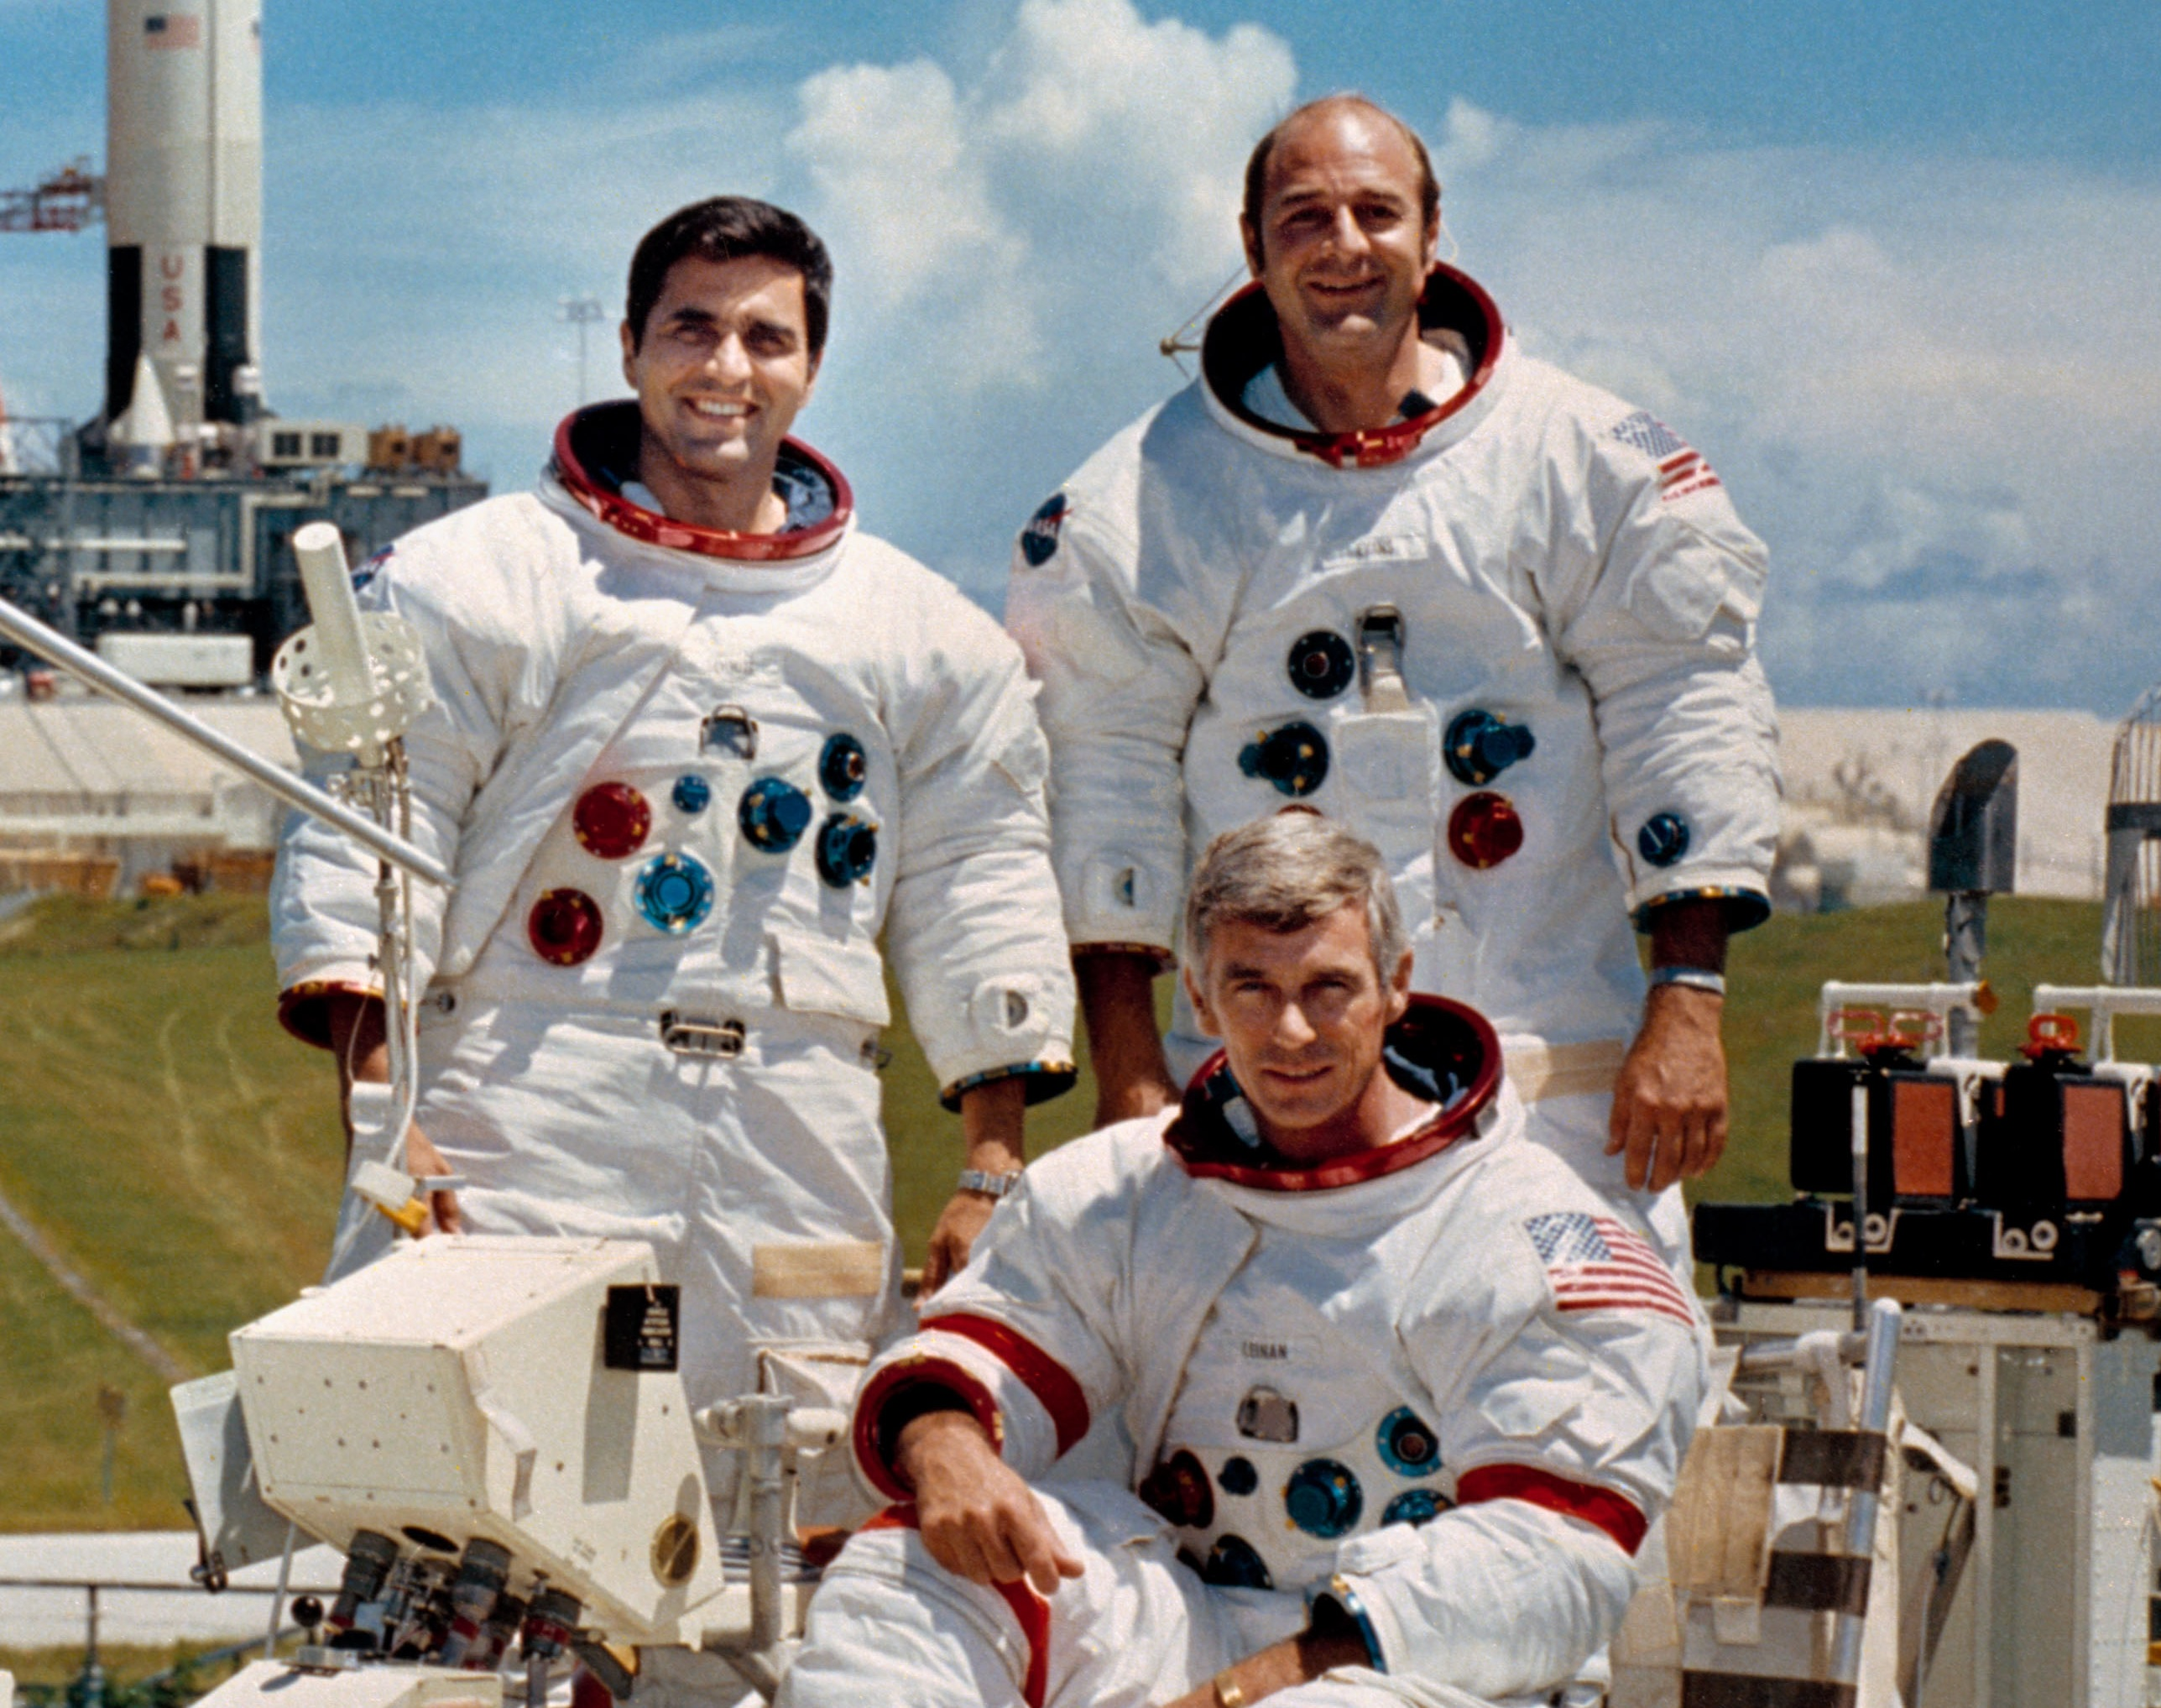 apollo space missions crews - photo #17